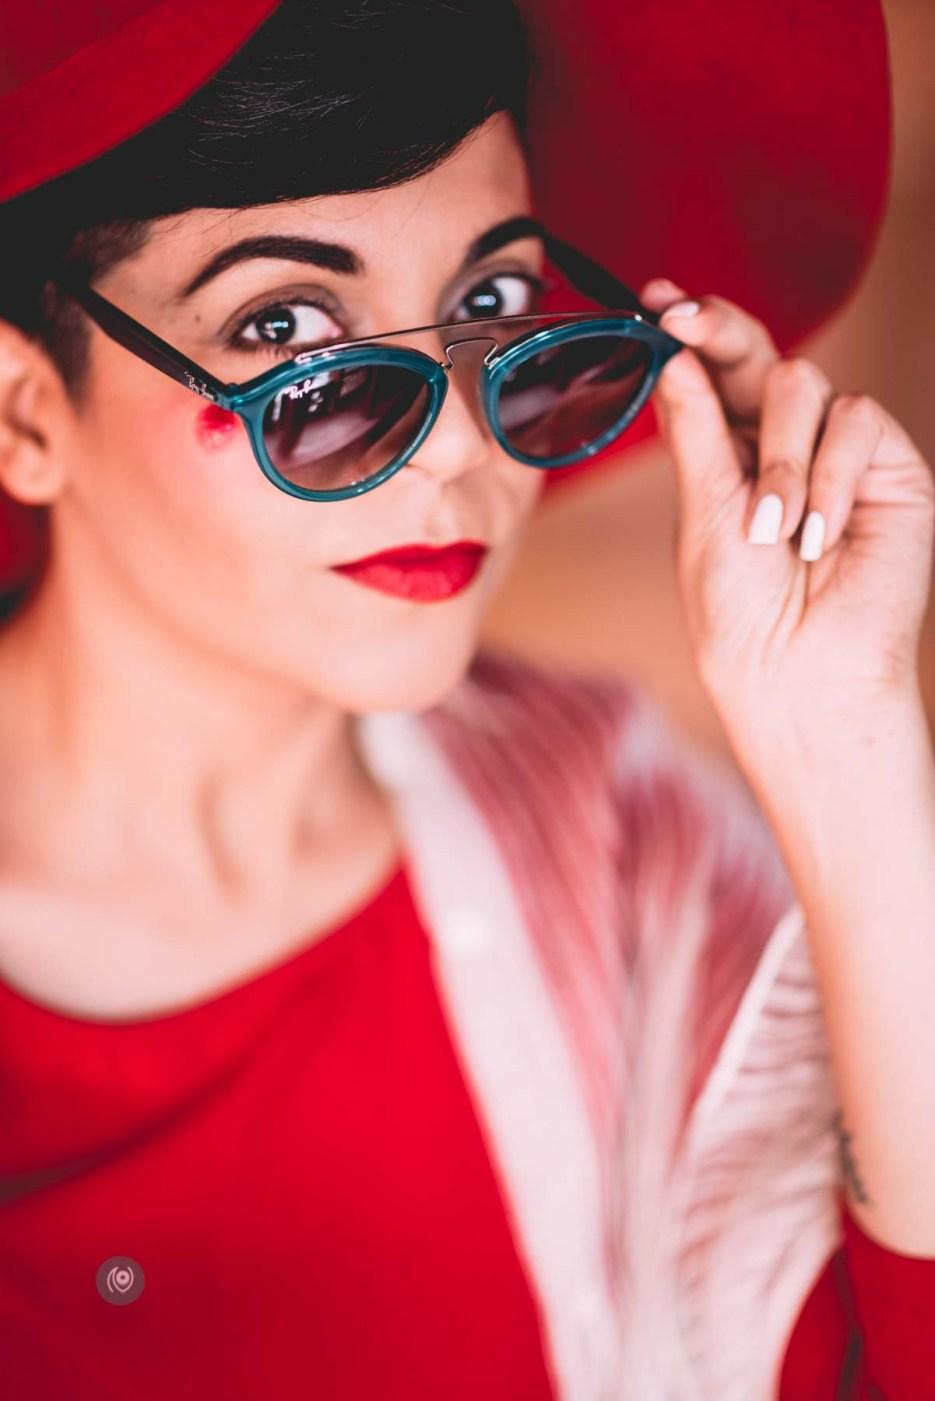 Experience Collector, Lifestyle, Lifestyle Blogger, Lifestyle Blogger India, Lifestyle Photographer India, Luxury Blogger, Luxury Blogger India, Luxury Brands, Luxury Photographer, Luxury Photographer India, Naina Redhu, Naina.co, Professional Photographer, Visual Storyteller, Visual Storyteller for Luxury Brands, Influencer, Luxury Influencer, Lifestyle Influencer, Photography Influencer, Brand Storyteller, Visual Storyteller, India, #EyesForIndia, #EyesForRajasthan, Rajasthan, #EyesForDestinations, Travel, Travel Photographer, Travel Blogger, Bikaner, Narendra Bhawan, #NAINAxRayBan, #NAINAxPureGheeDesigns, #NAINAxPureGhee, #NAINAxNarendraBhawanBikaner, #NAINAxNarendraBhawan, Mashru Silk, #CoverUp, Bucket Bag, Textile Flowers Gajra, Gatsby II, Gatsby 2 Sunglasses, Sunglasses by Ray-Ban, Ray-Ban, Art Deco, Kitsch, Retro